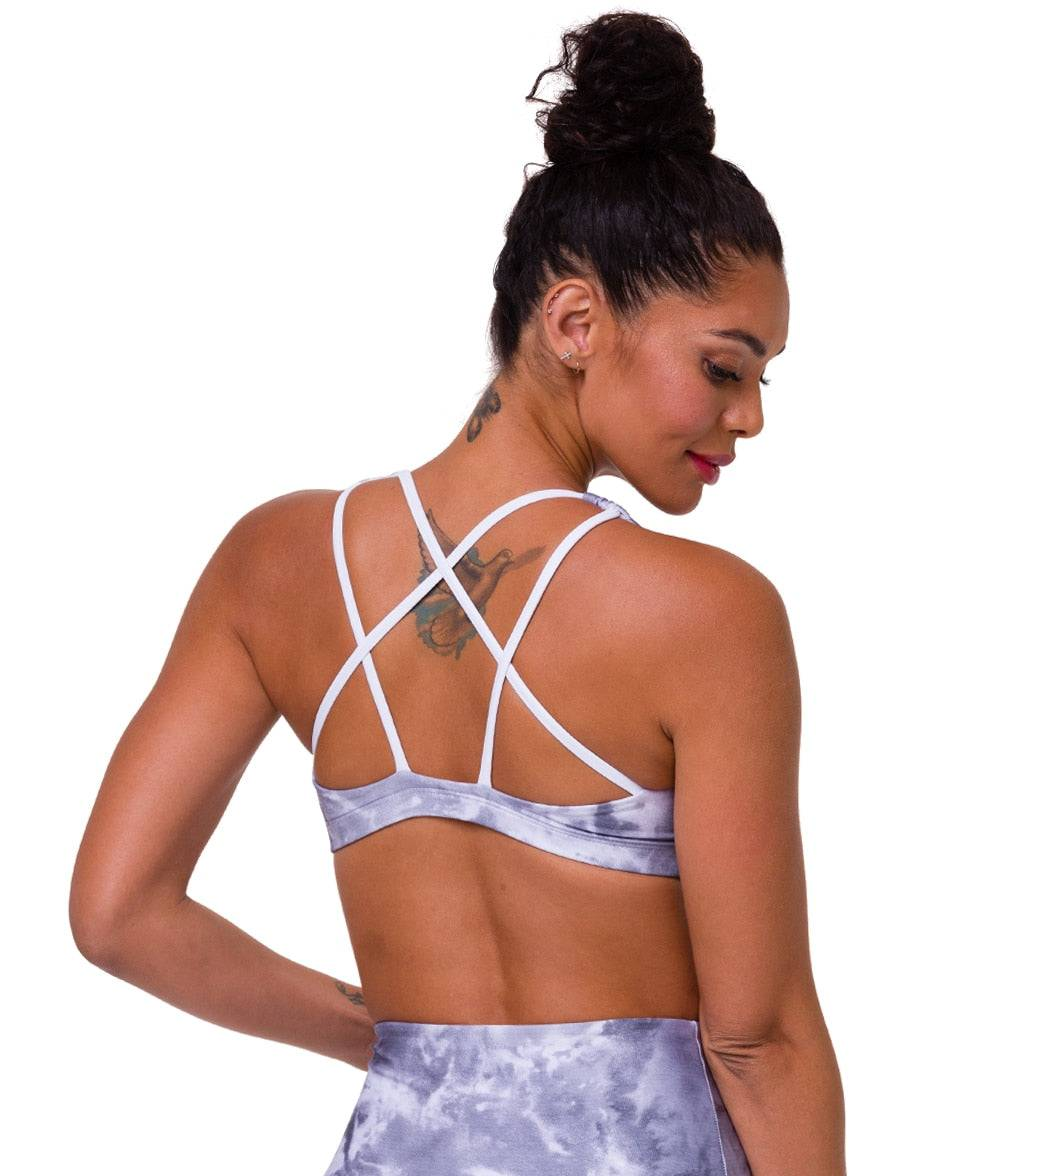 Onzie Women's Graphic Mudra Yoga Sports Bra - Light Gray Tie Dye Small/Medium